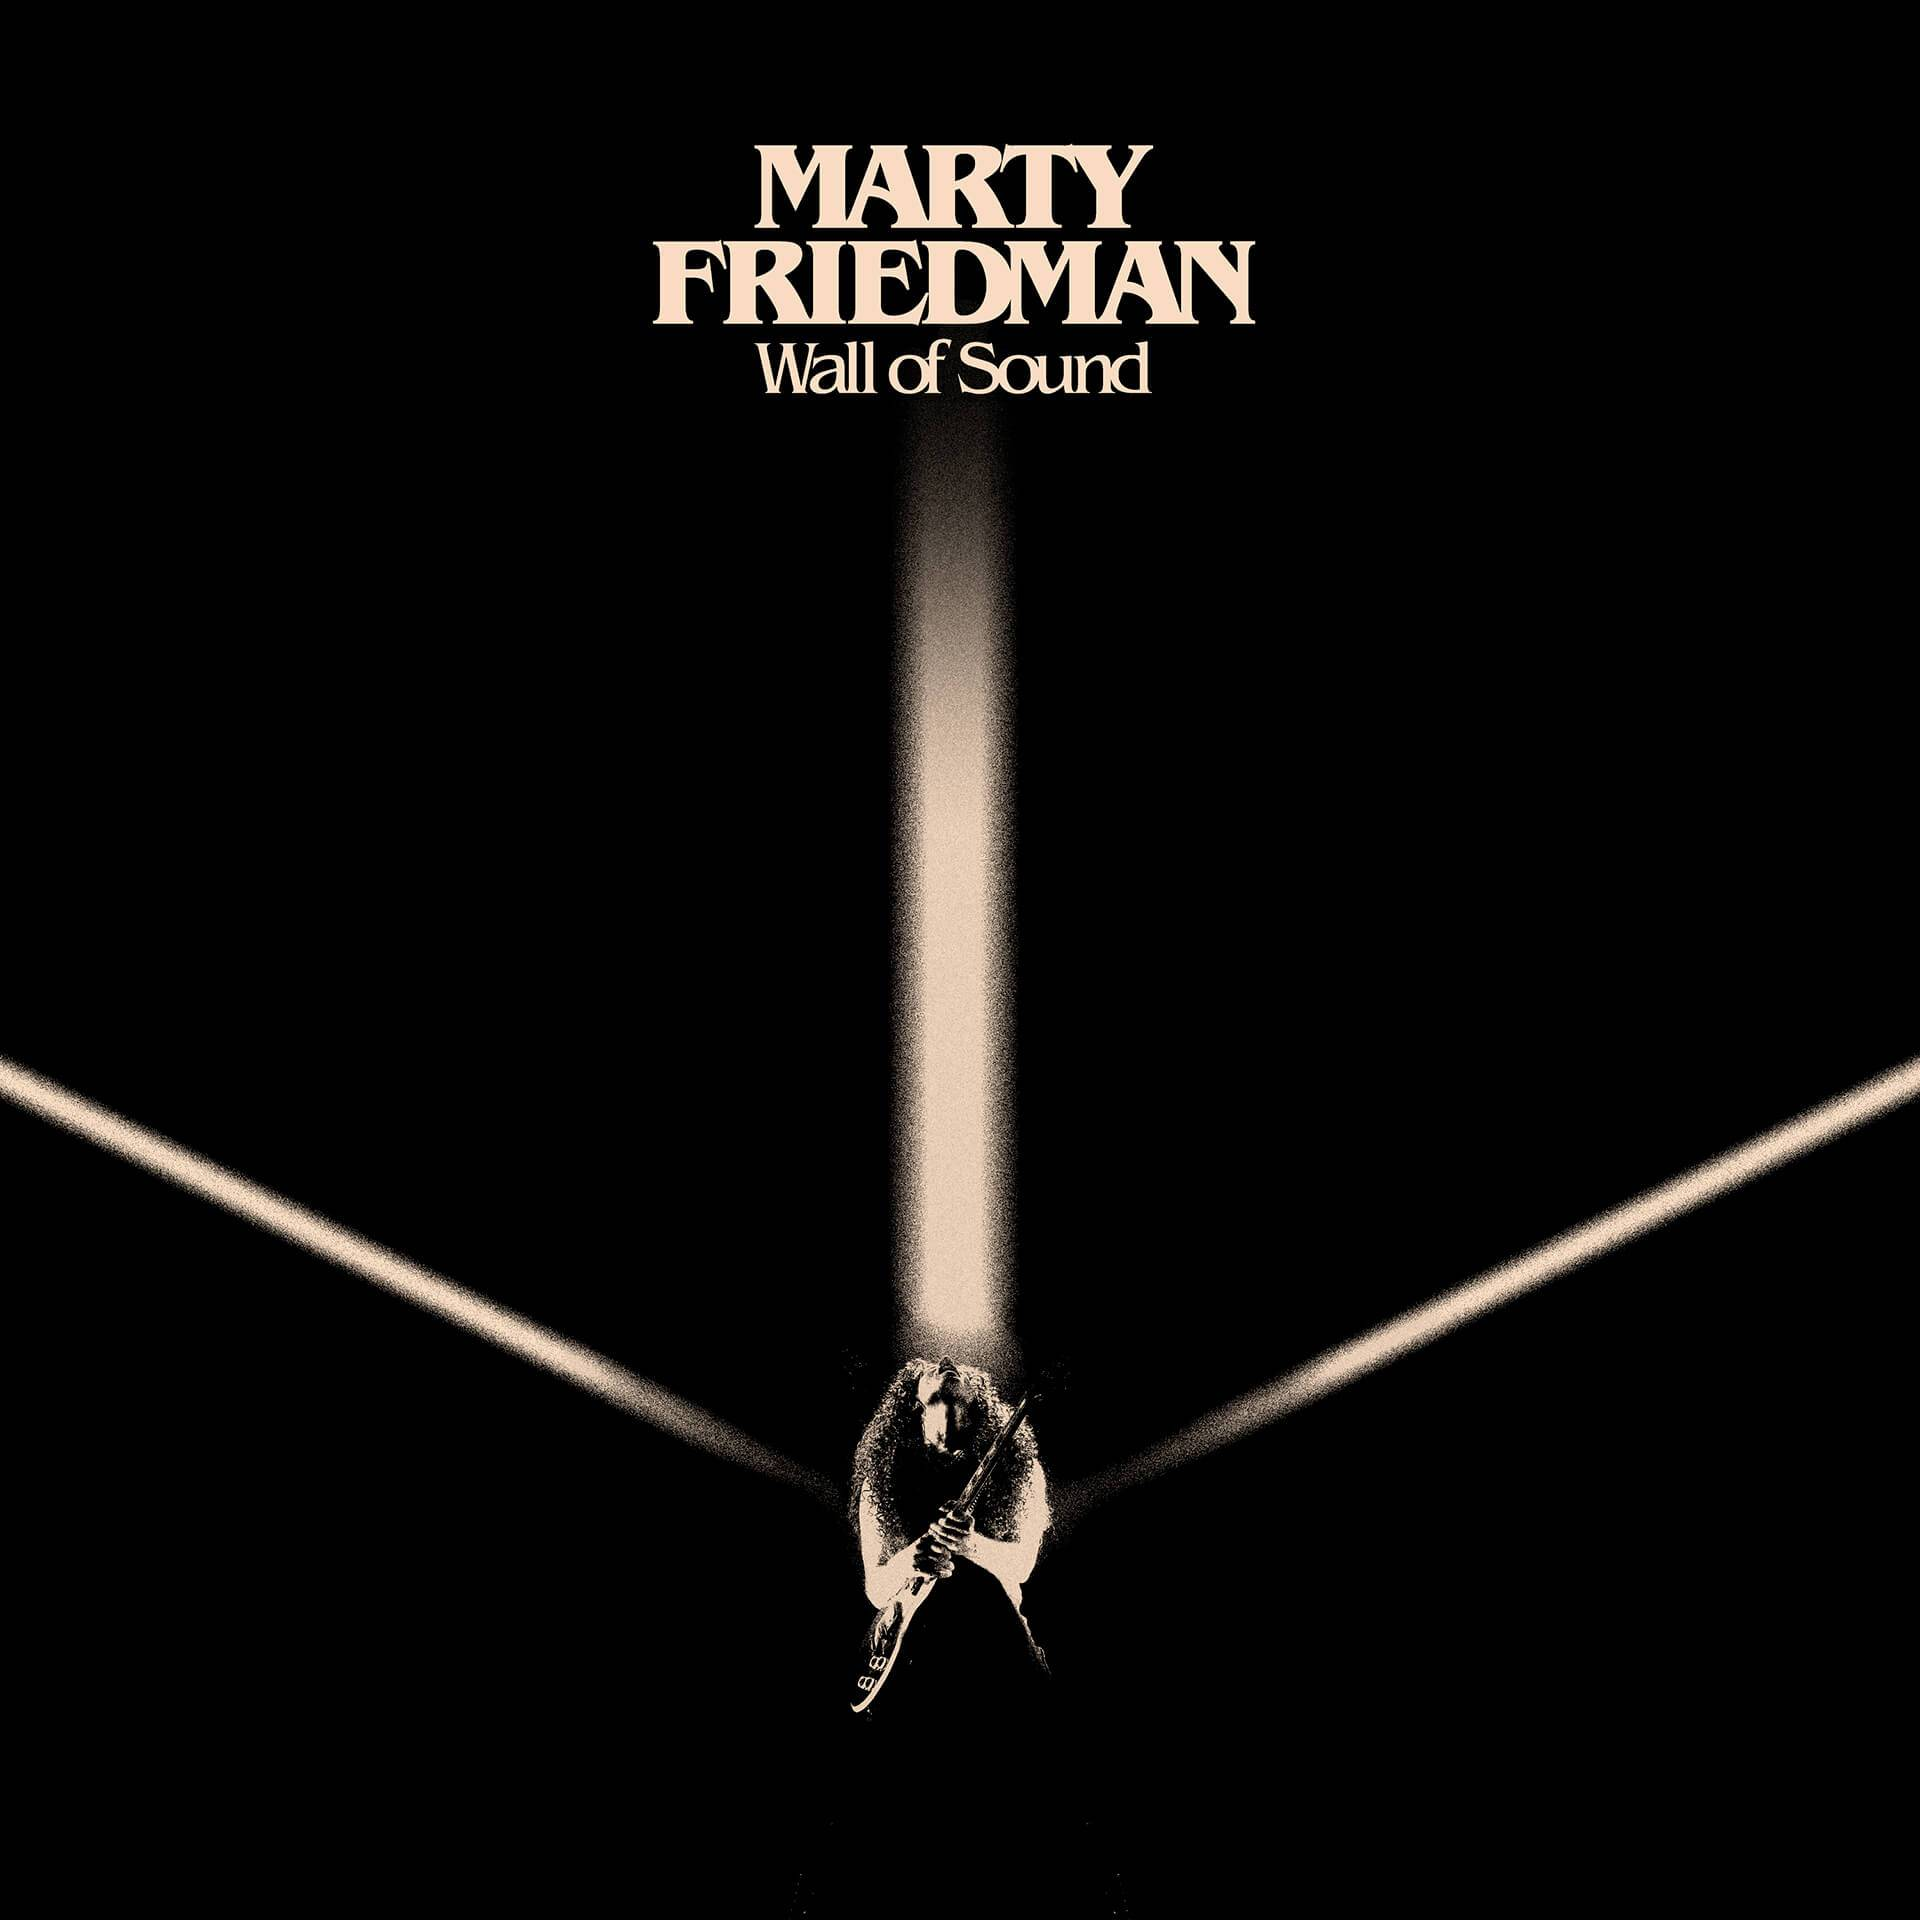 Marty Friedman – Wall of Sound